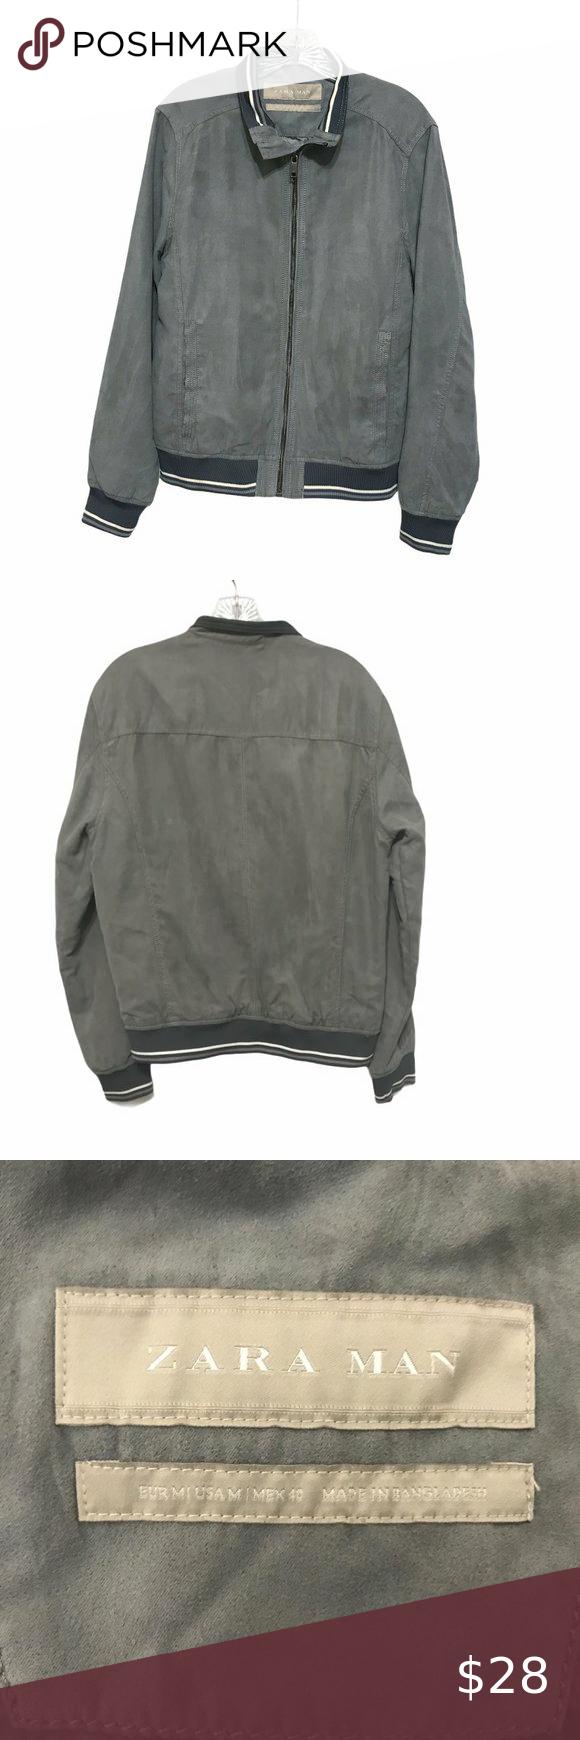 Zara Man Faux Suede Bomber Jacket Brown Leather Bomber Jacket Zara Bomber Jacket Suede Bomber Jacket